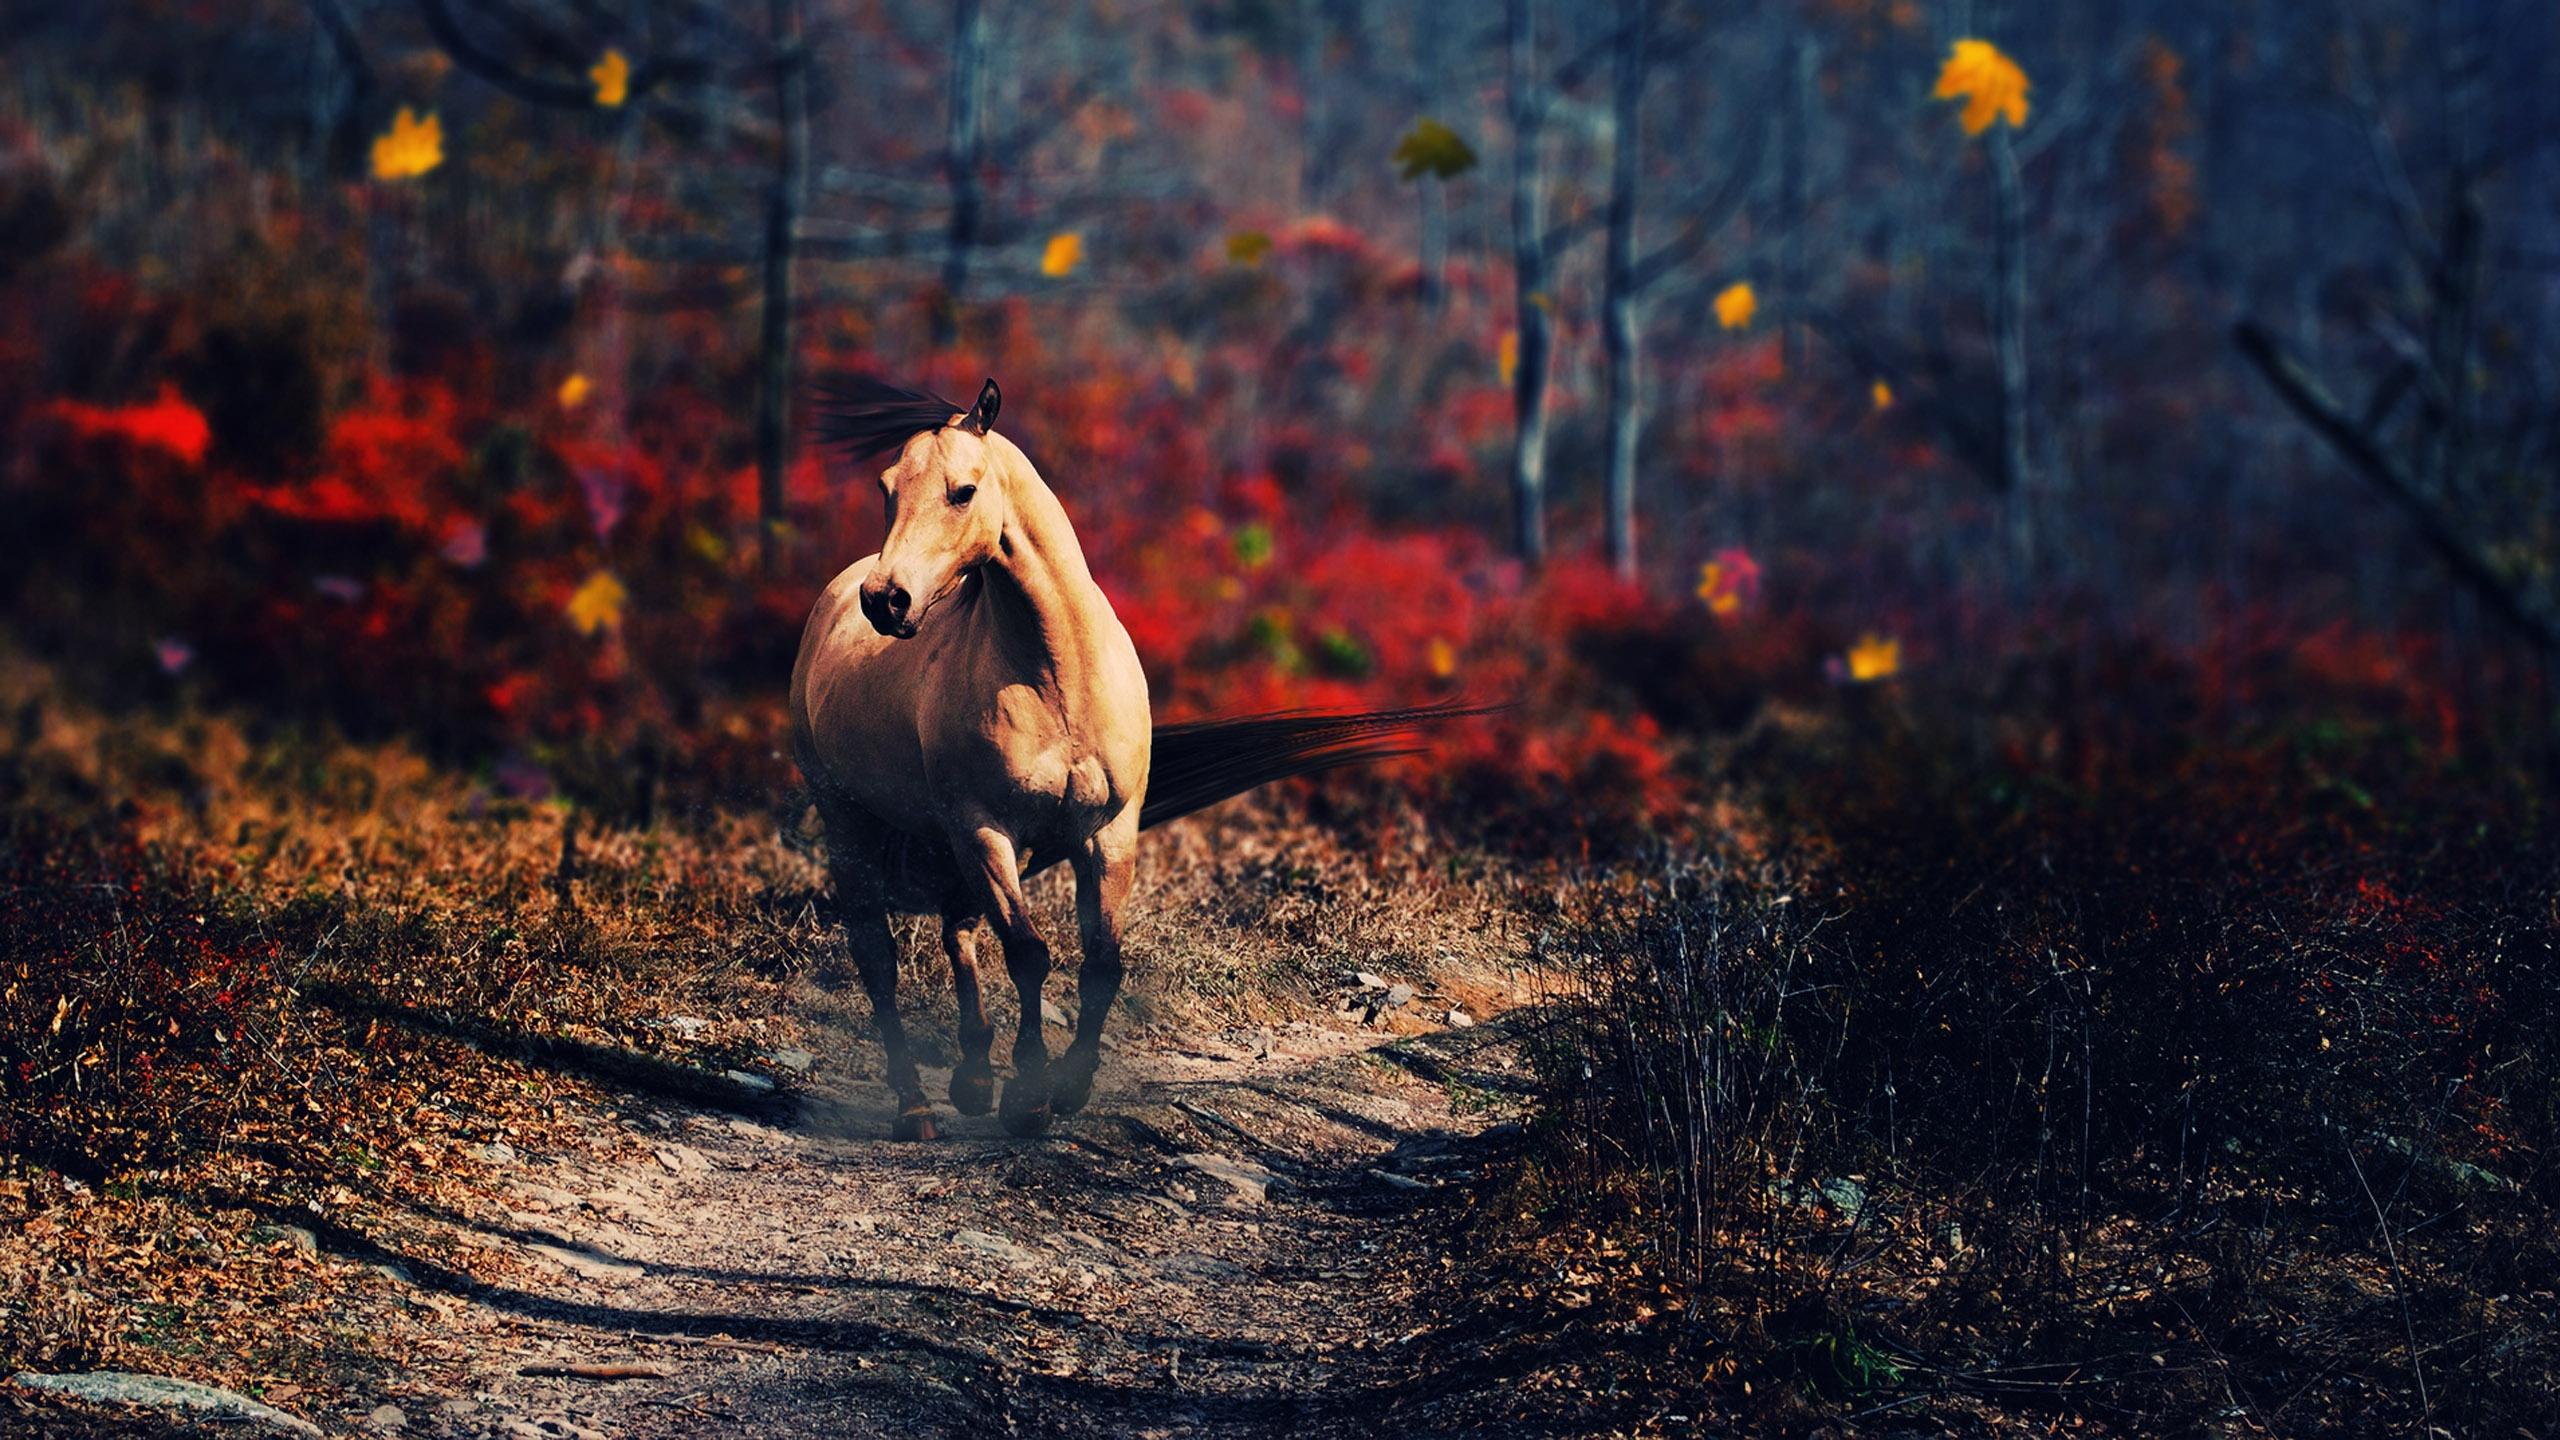 Animal Horse 2560x1440